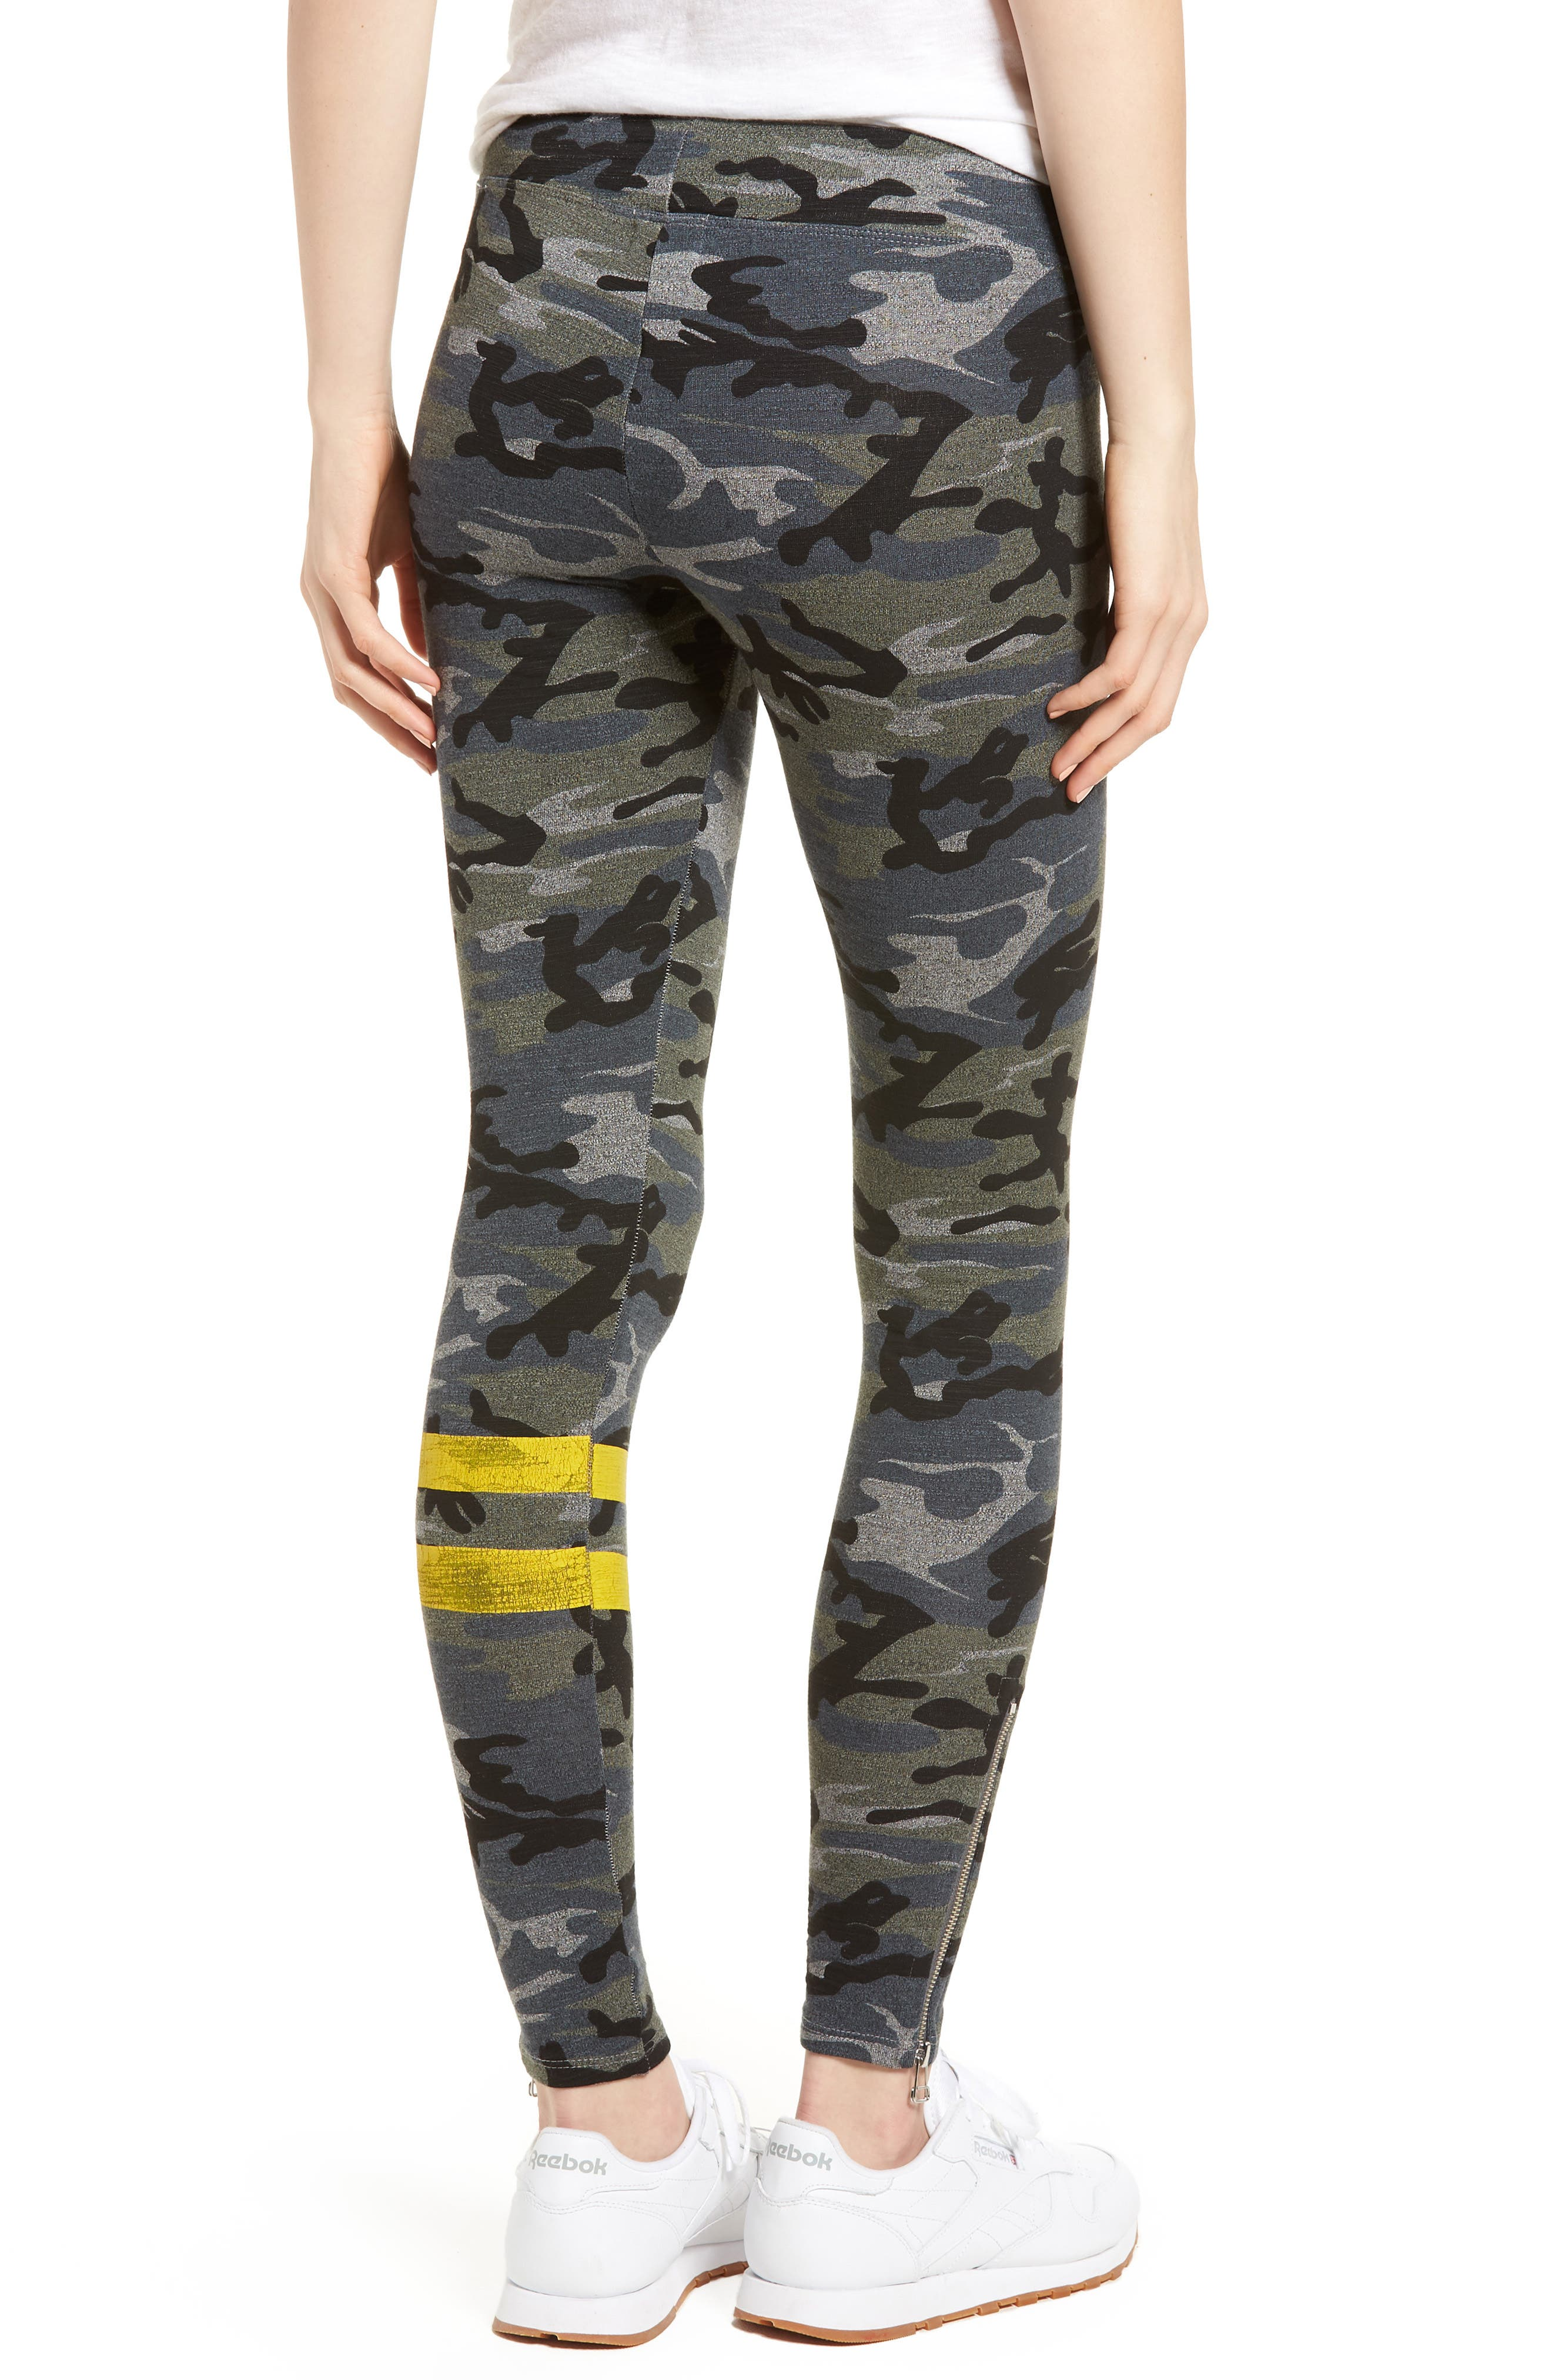 Stripe Camo Yoga Pants,                             Alternate thumbnail 2, color,                             020